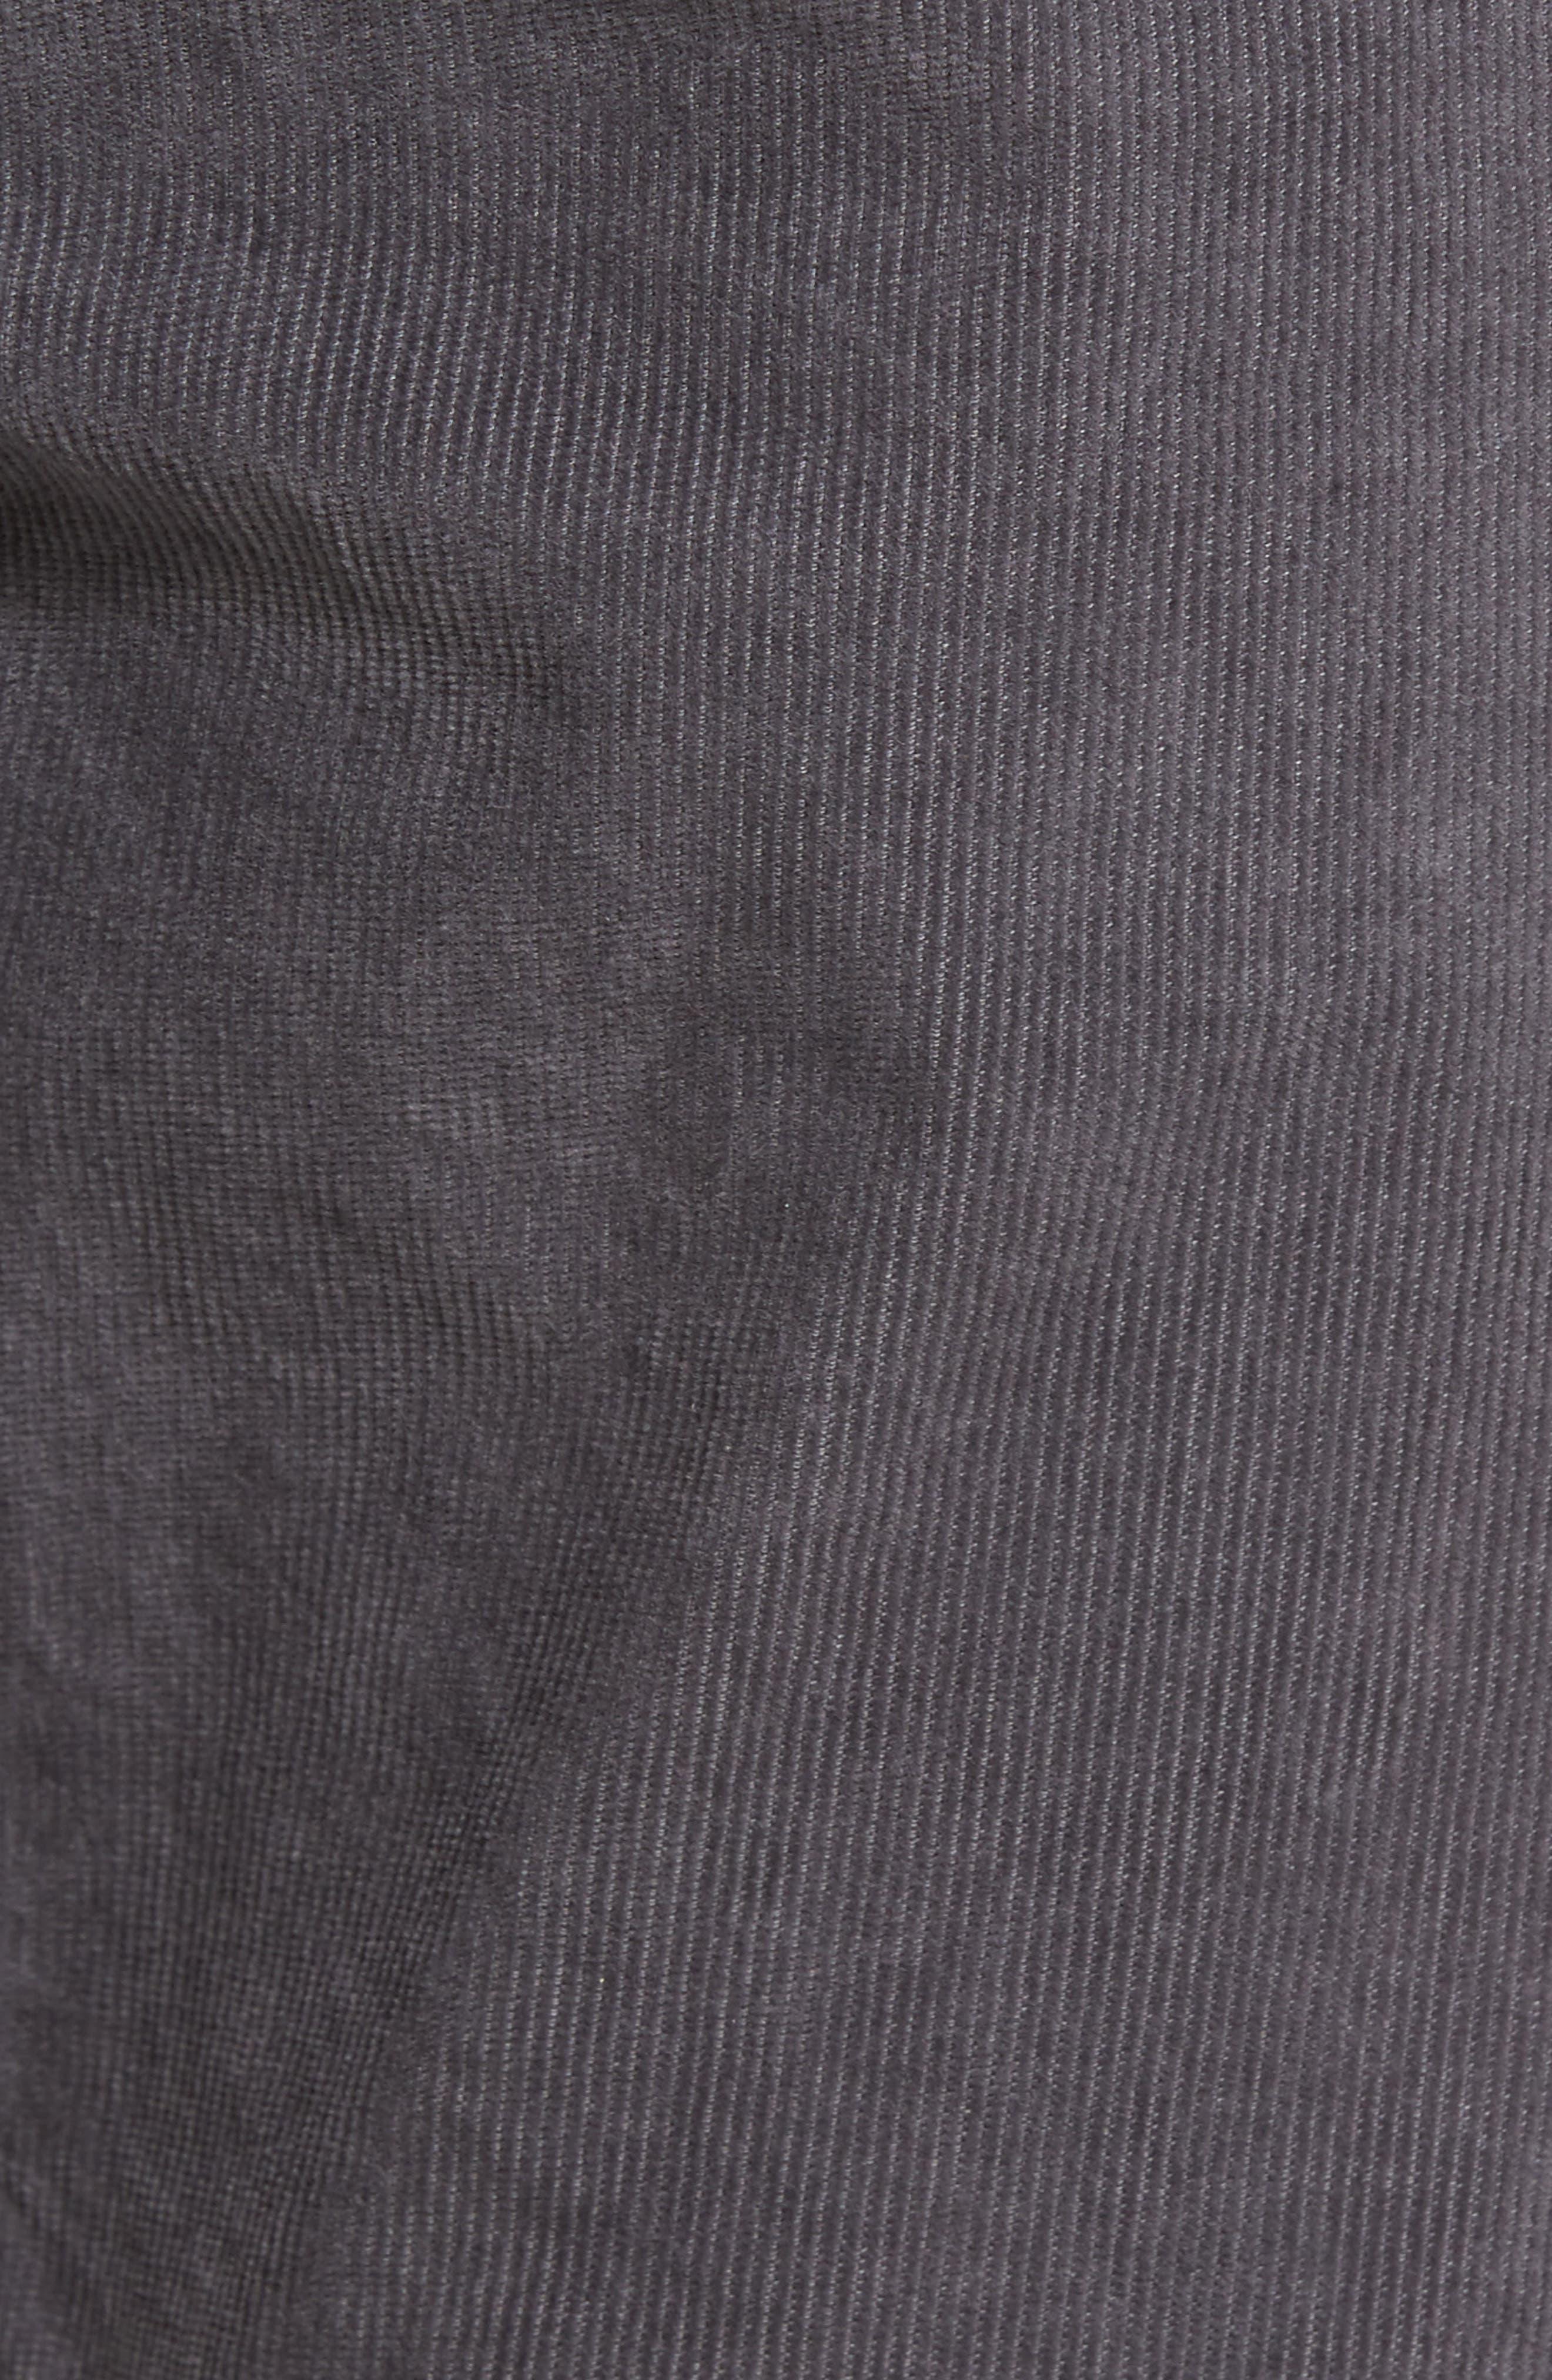 Everett Straight Leg Corduroy Pants,                             Alternate thumbnail 6, color,                             Sulfur Field Stone